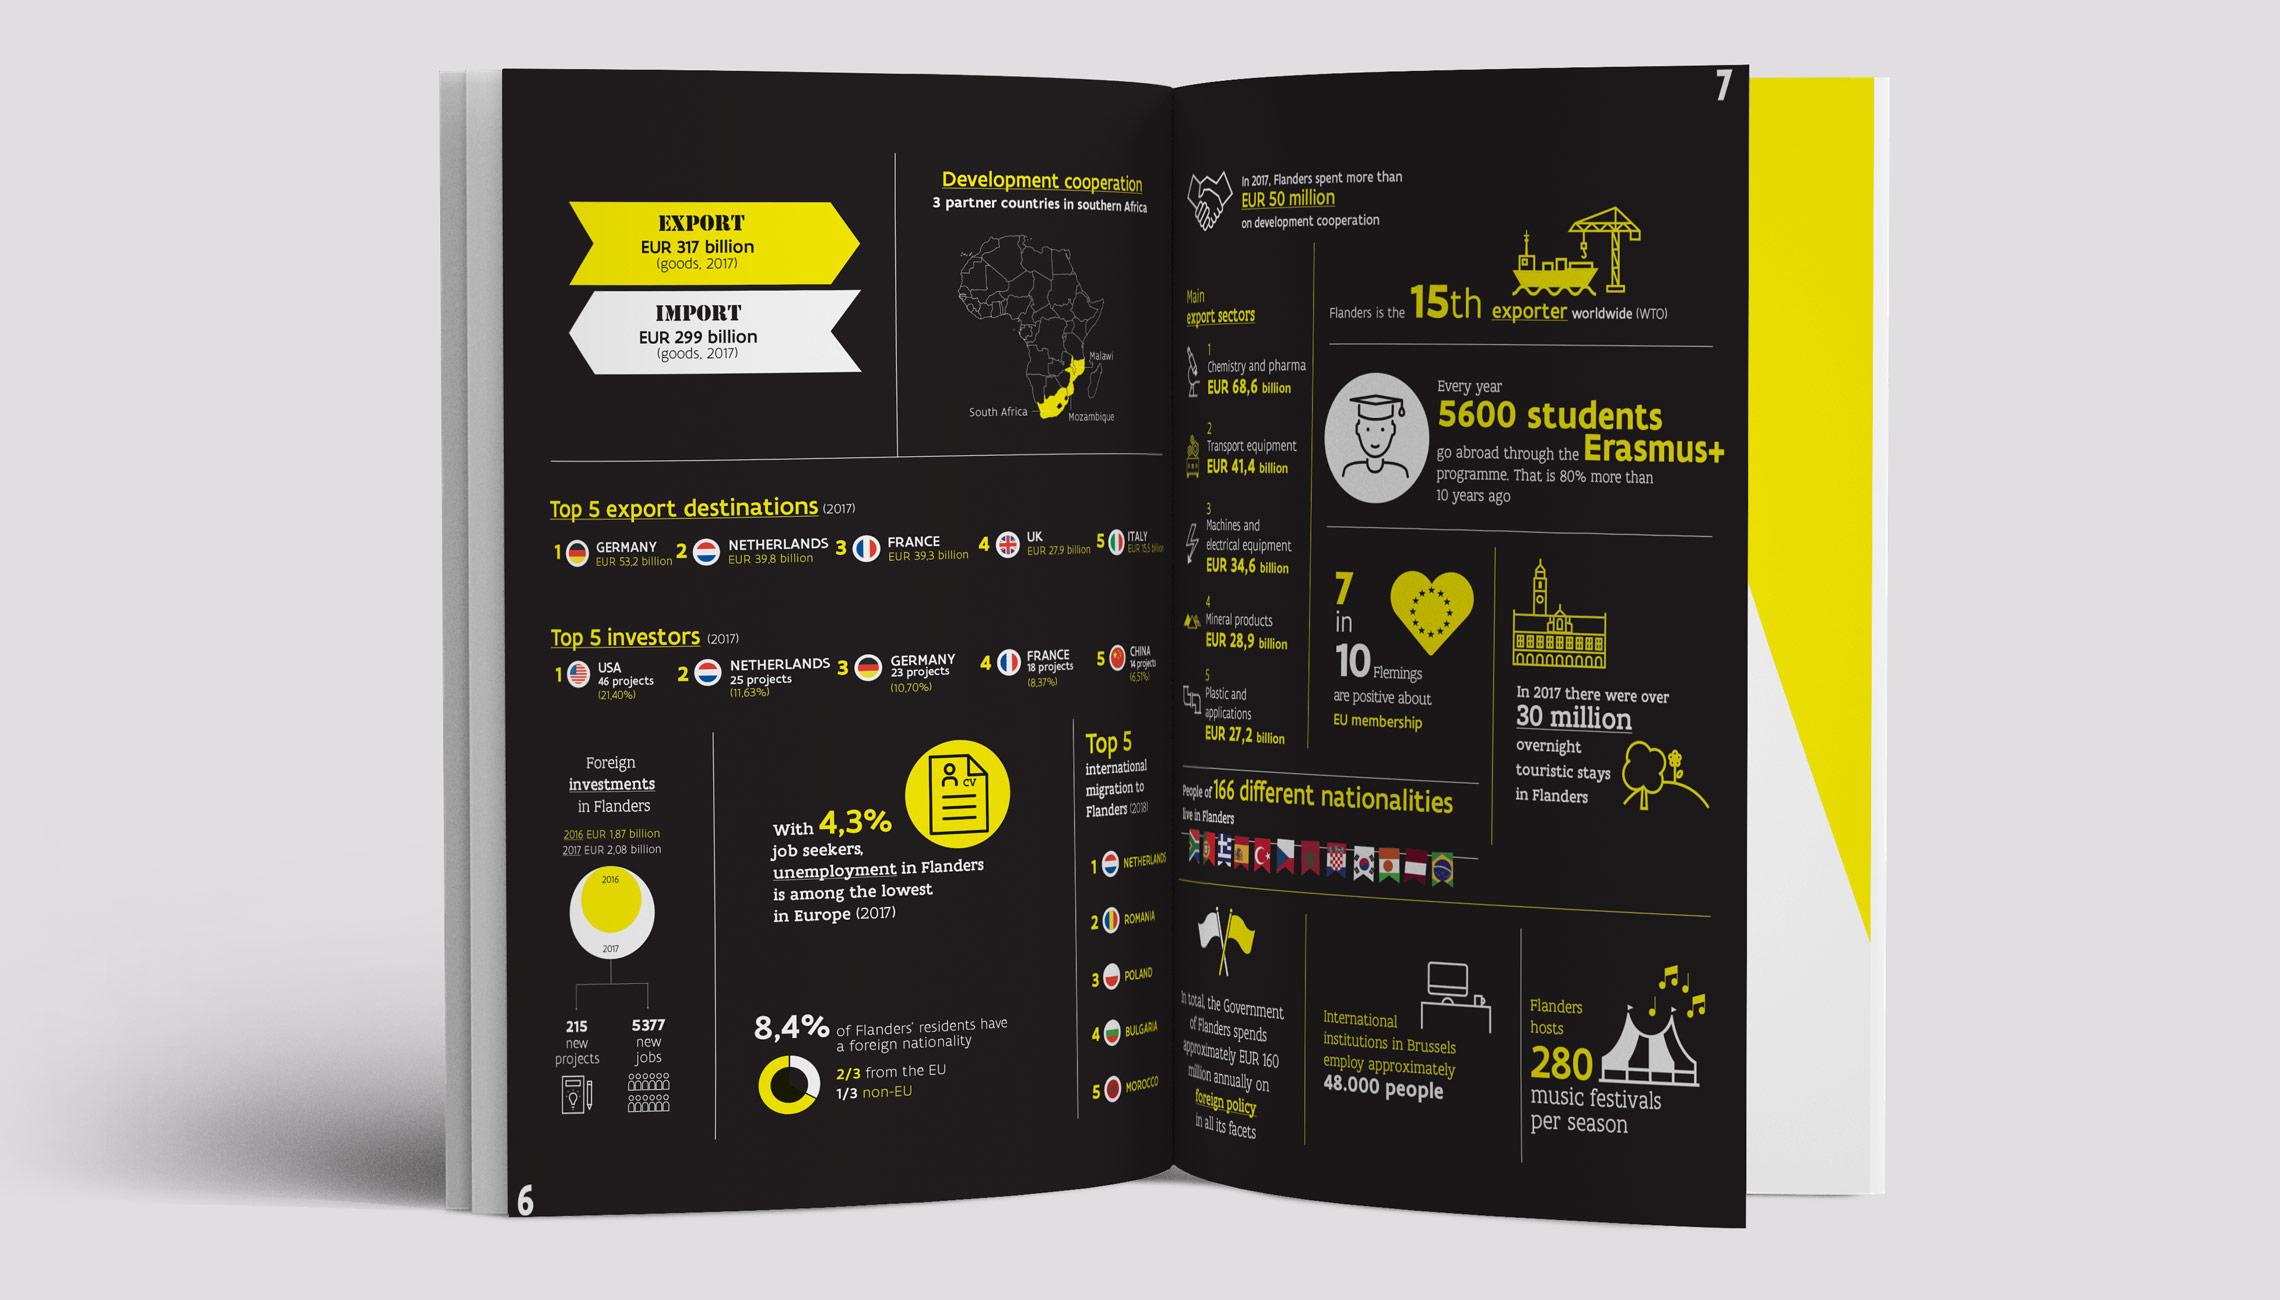 publication: Flanders is international - image 3